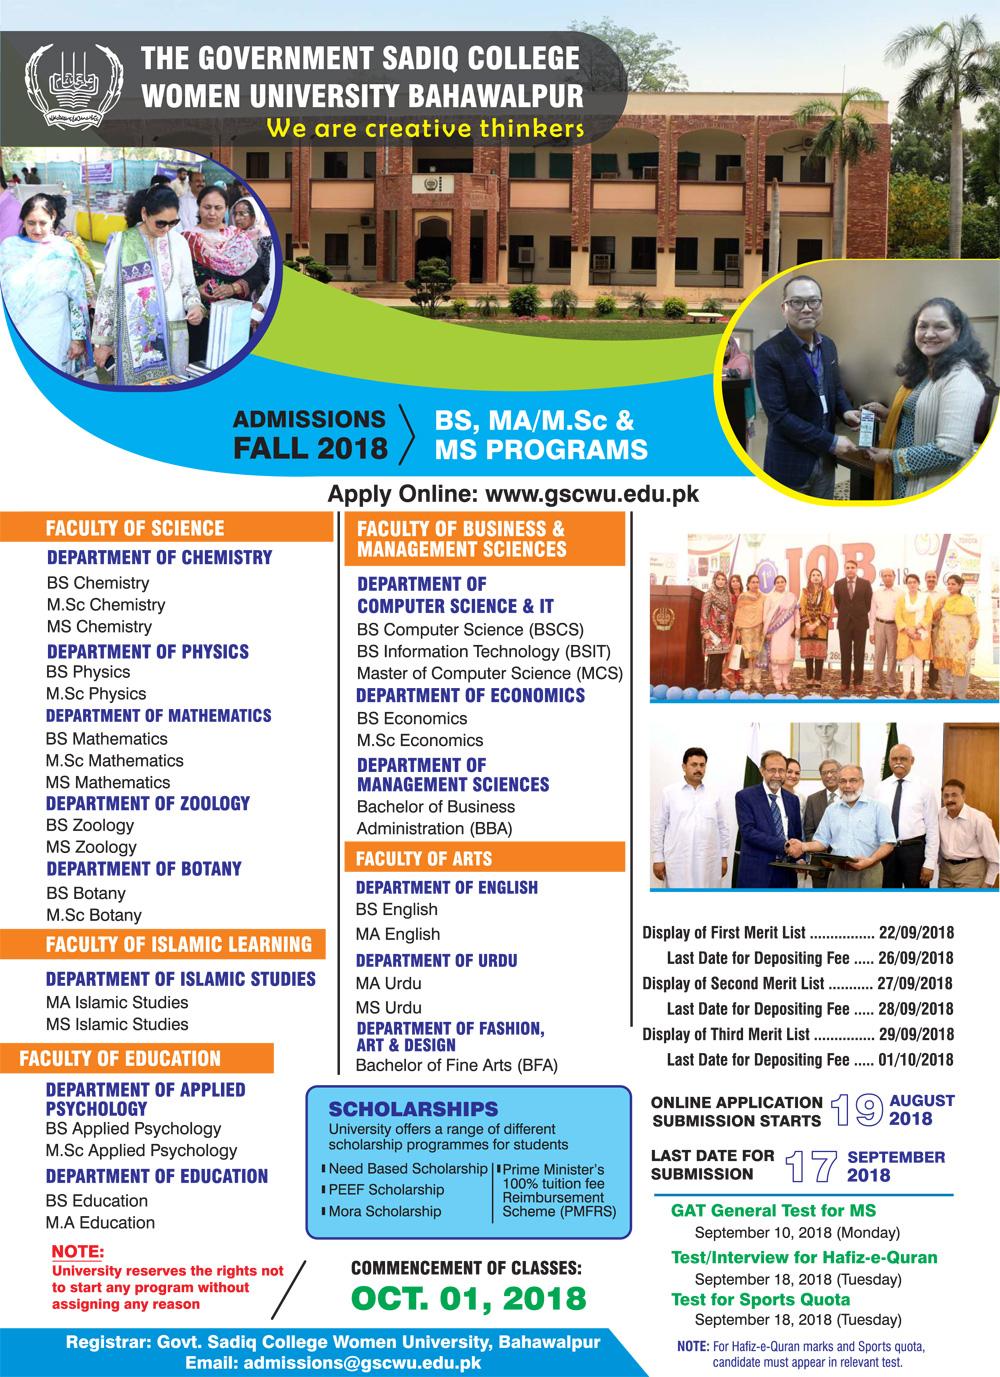 govt sadiq women university bahawalpur admission 2018